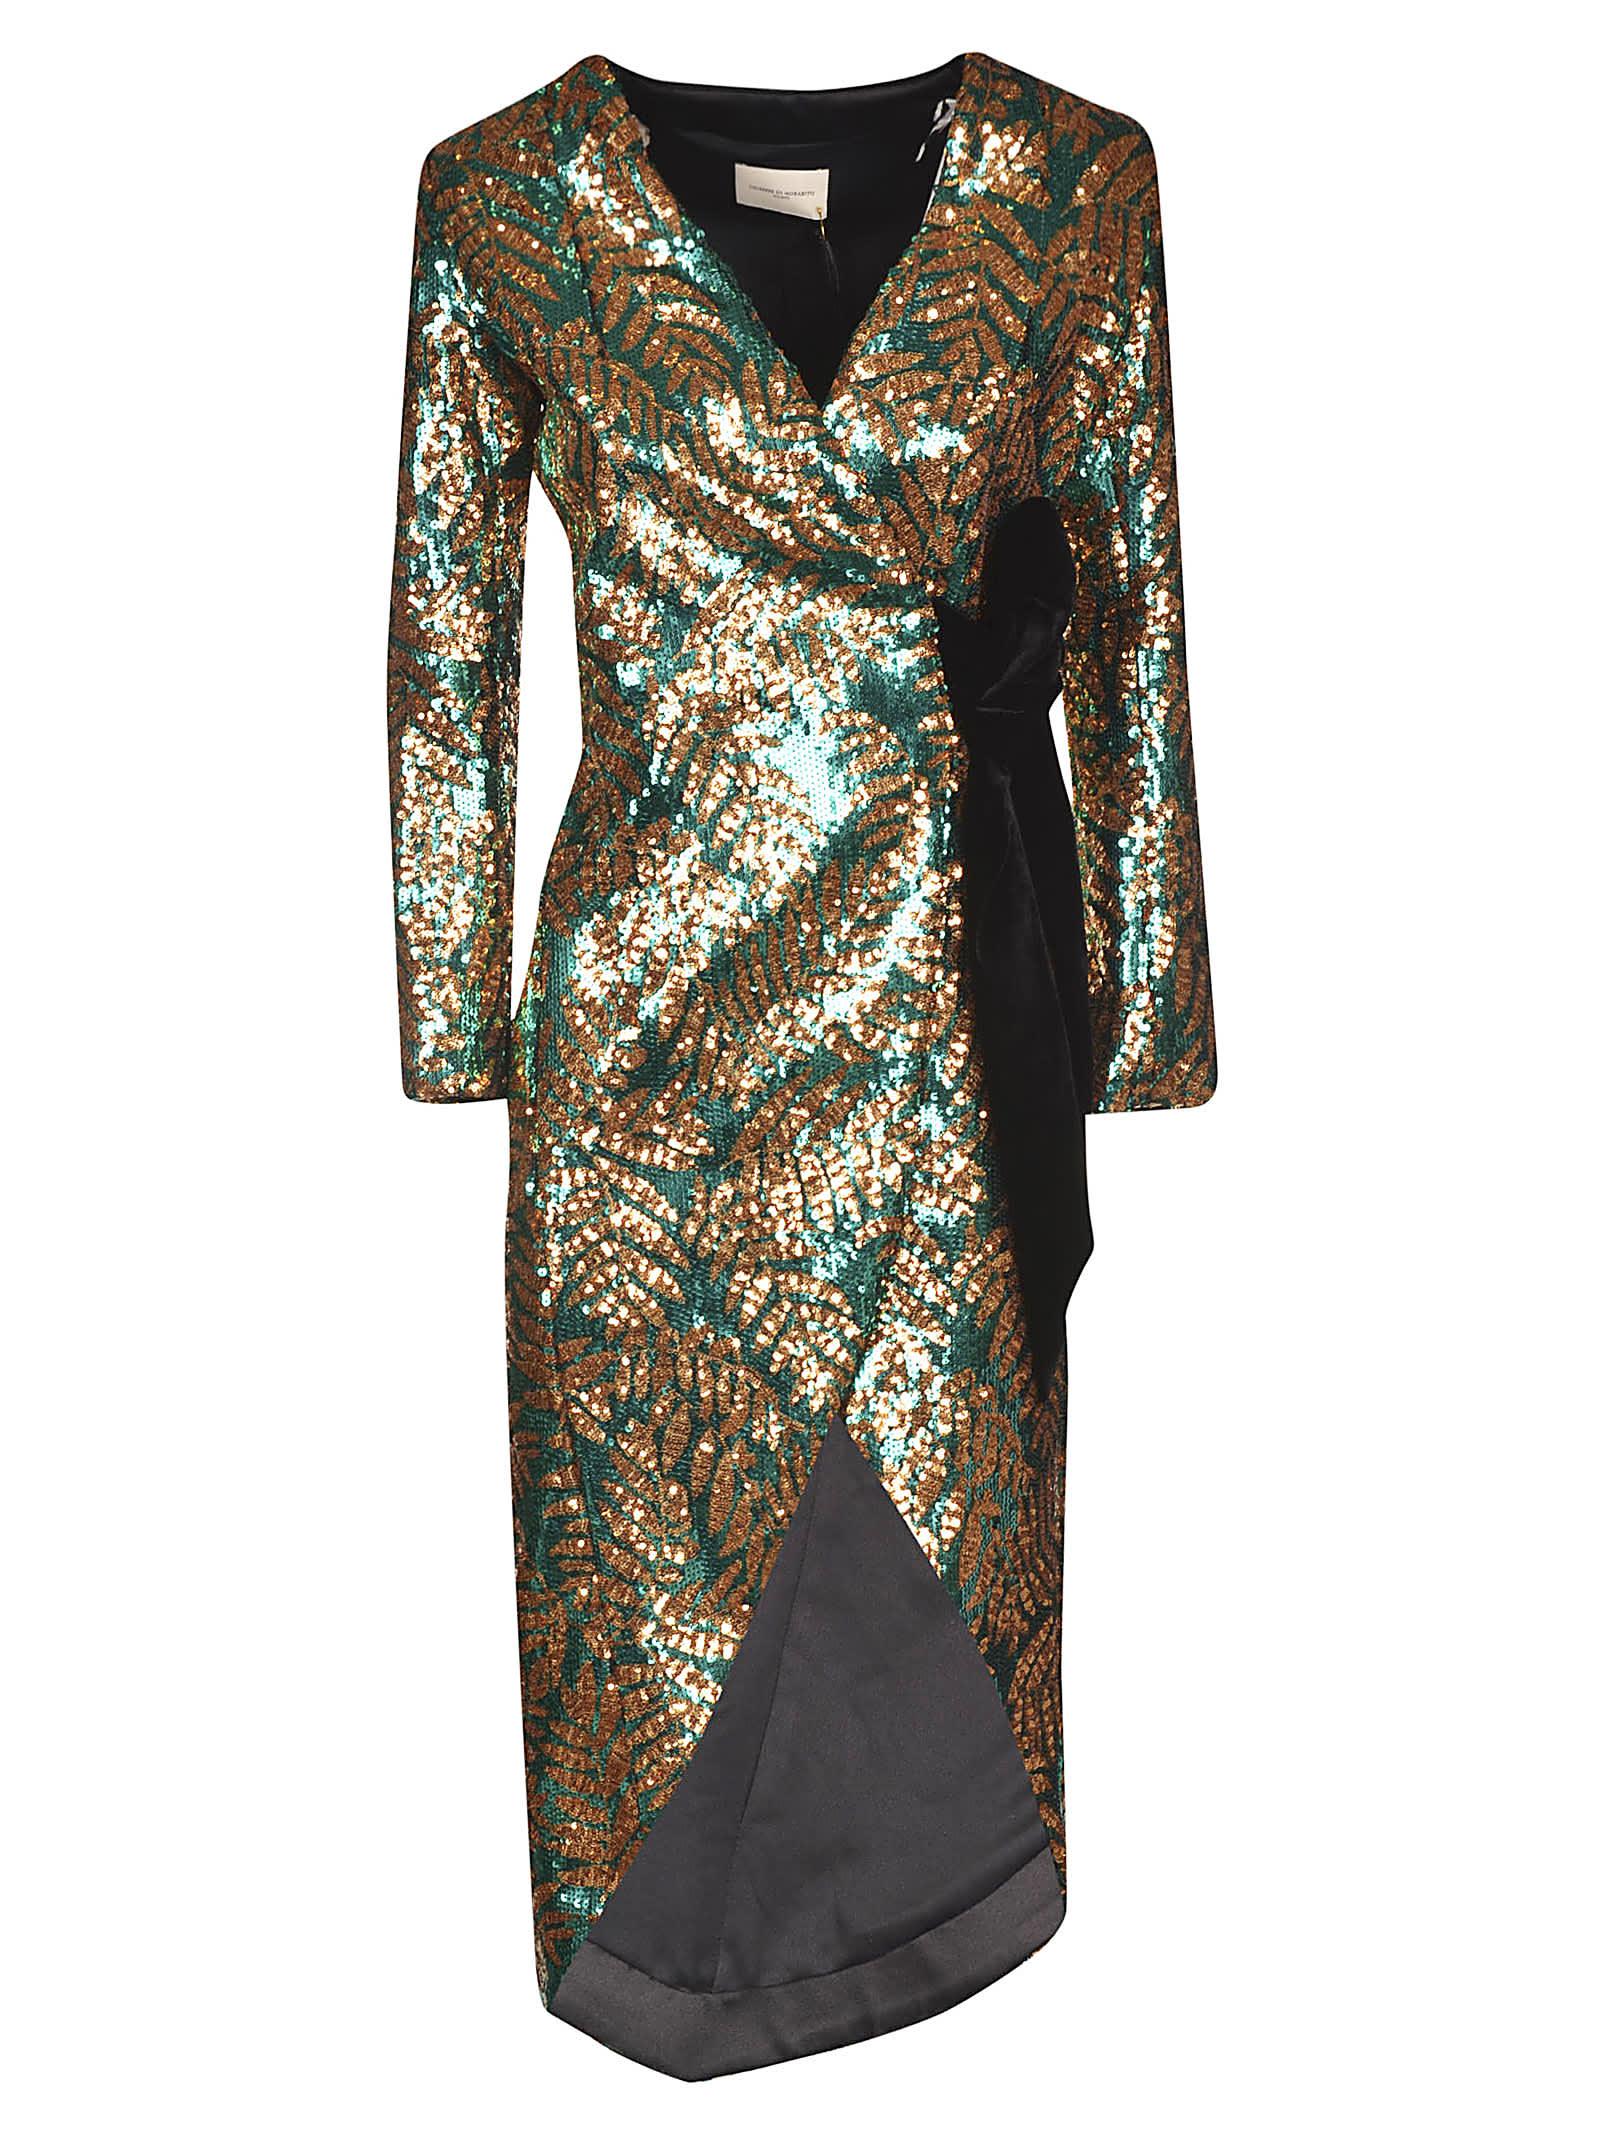 Giuseppe di Morabito Asymmetric Gathered Dress